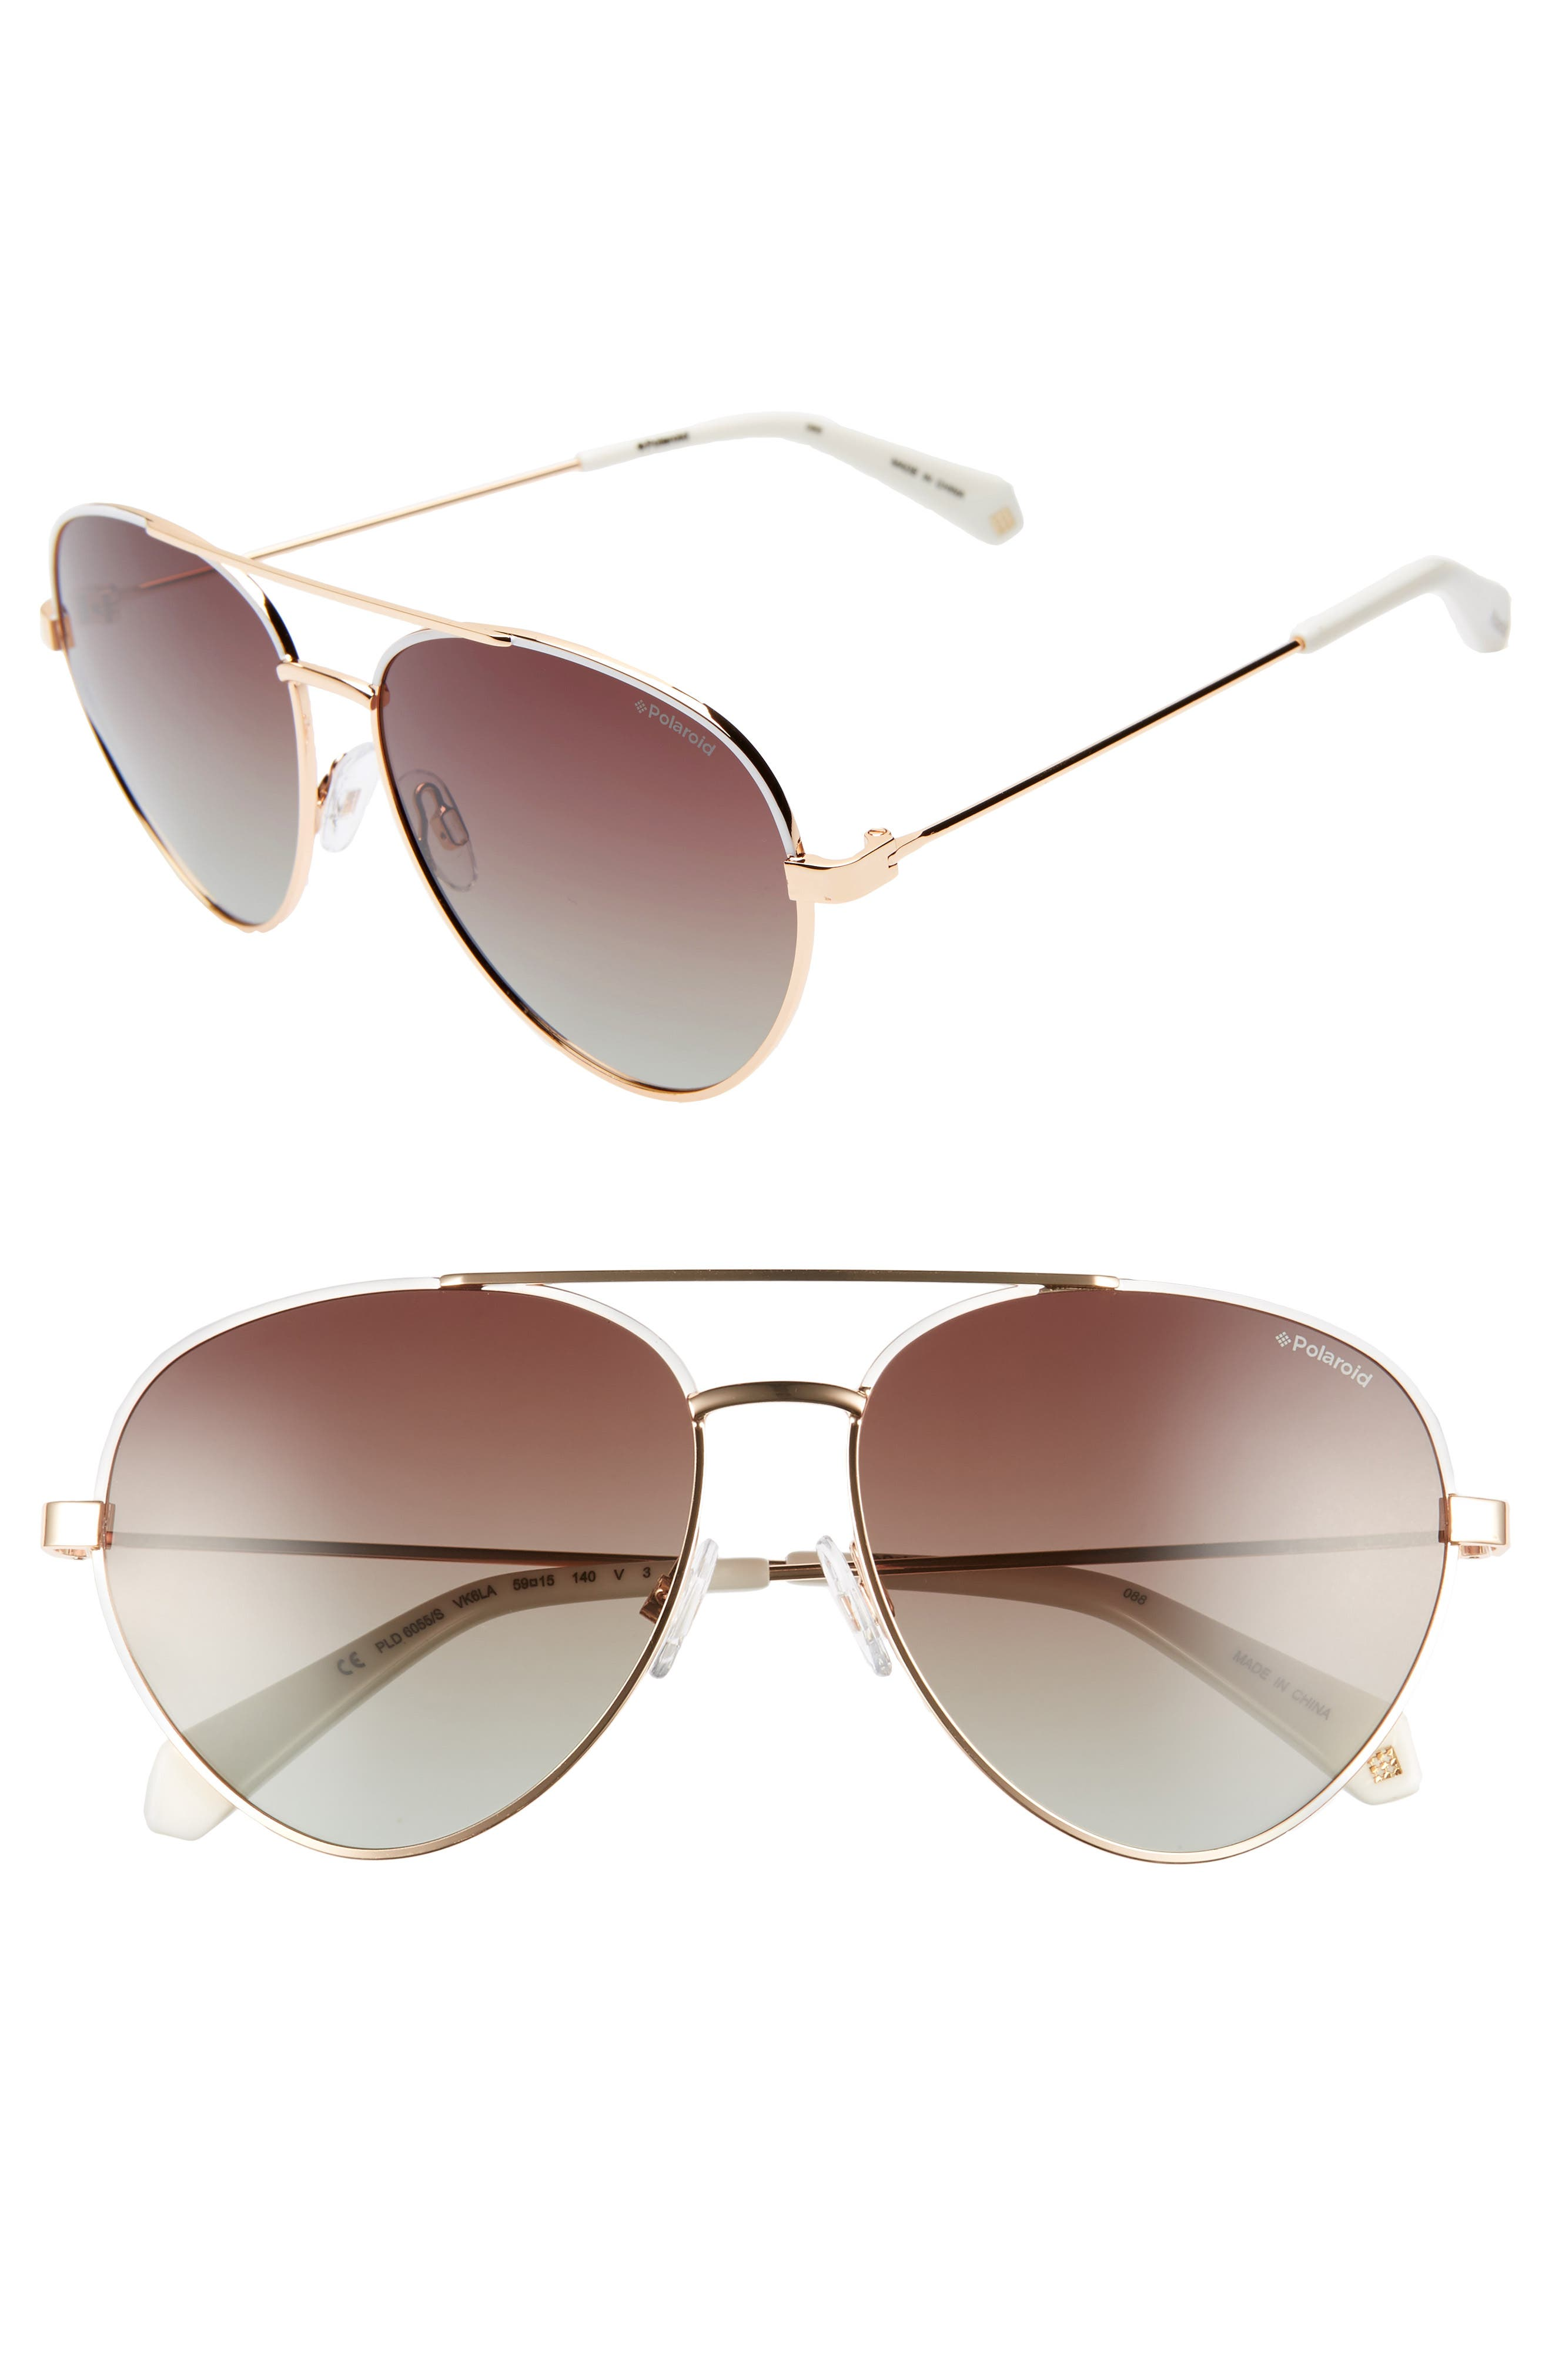 POLAROID 59Mm Polarized Aviator Sunglasses - White